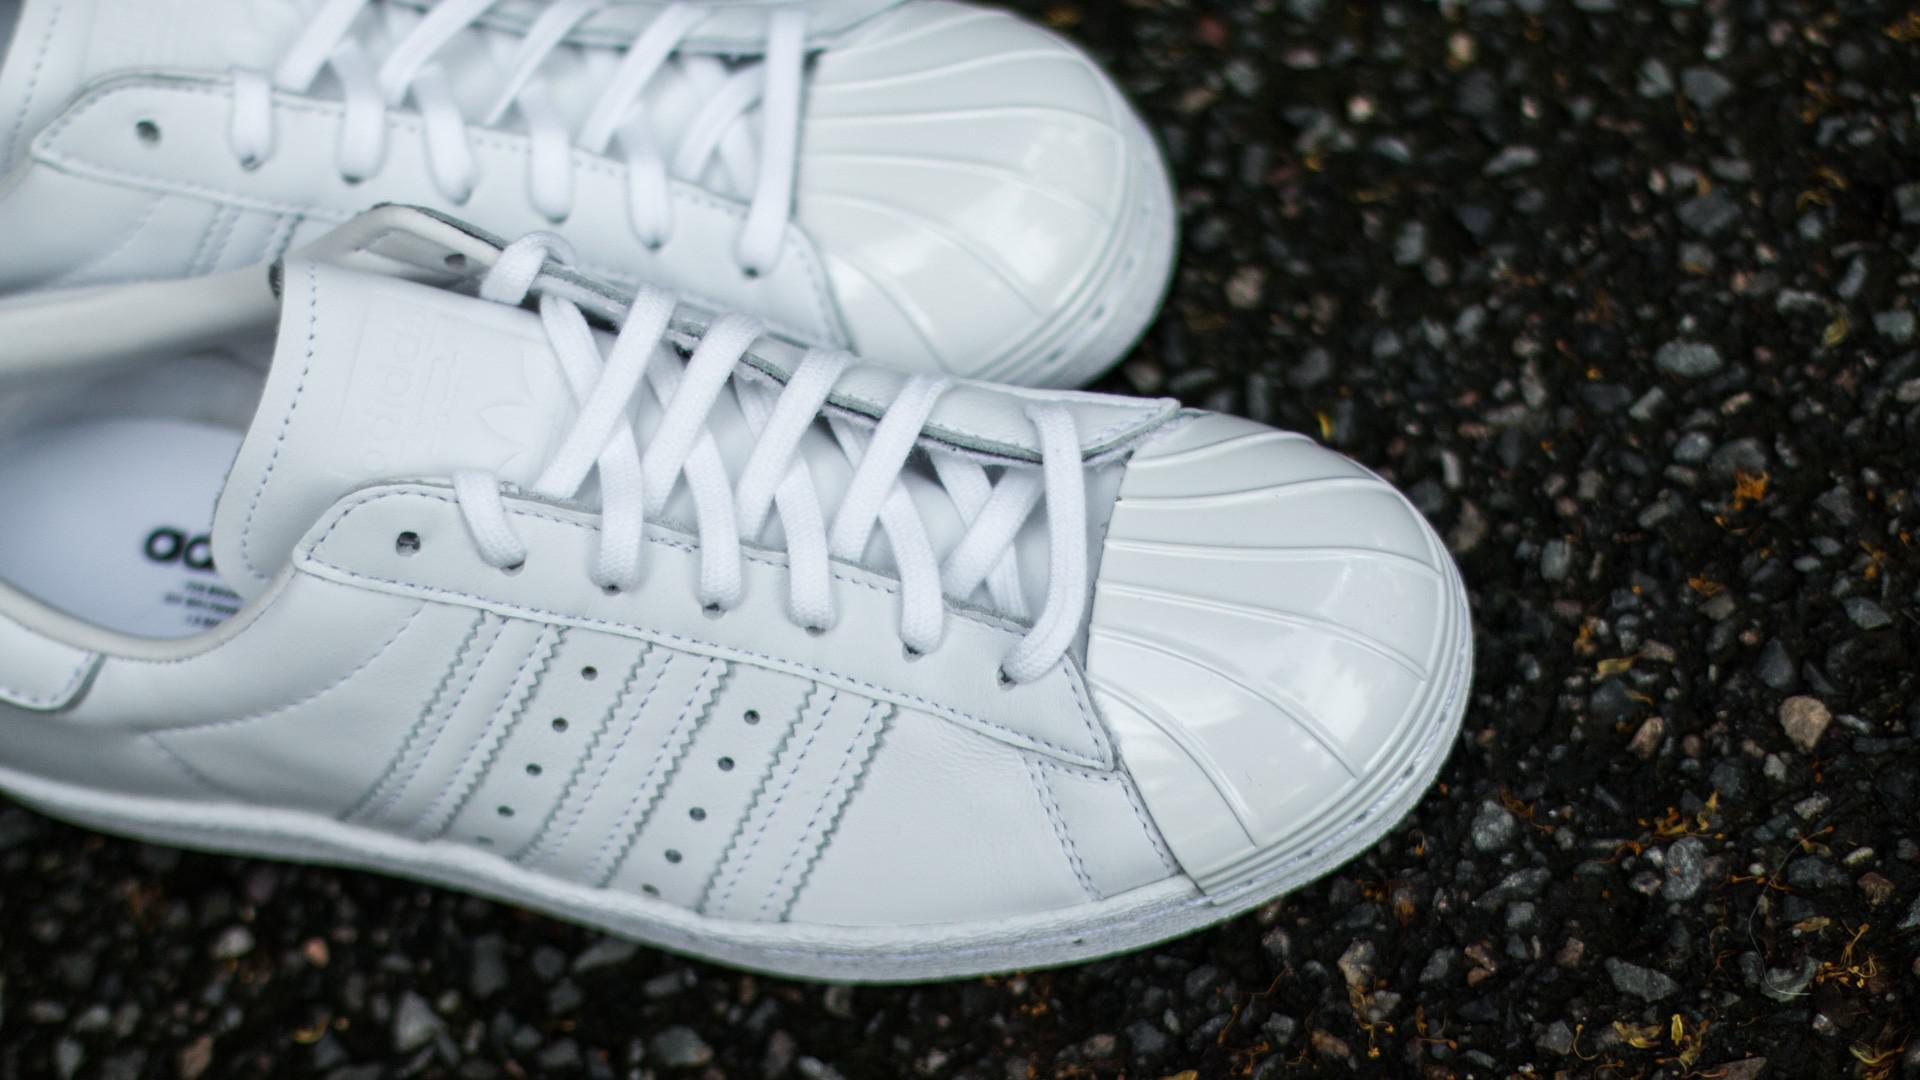 906c6484f2 Lyst - adidas Originals Adidas Superstar 80s Metal Toe W Ftw White ...